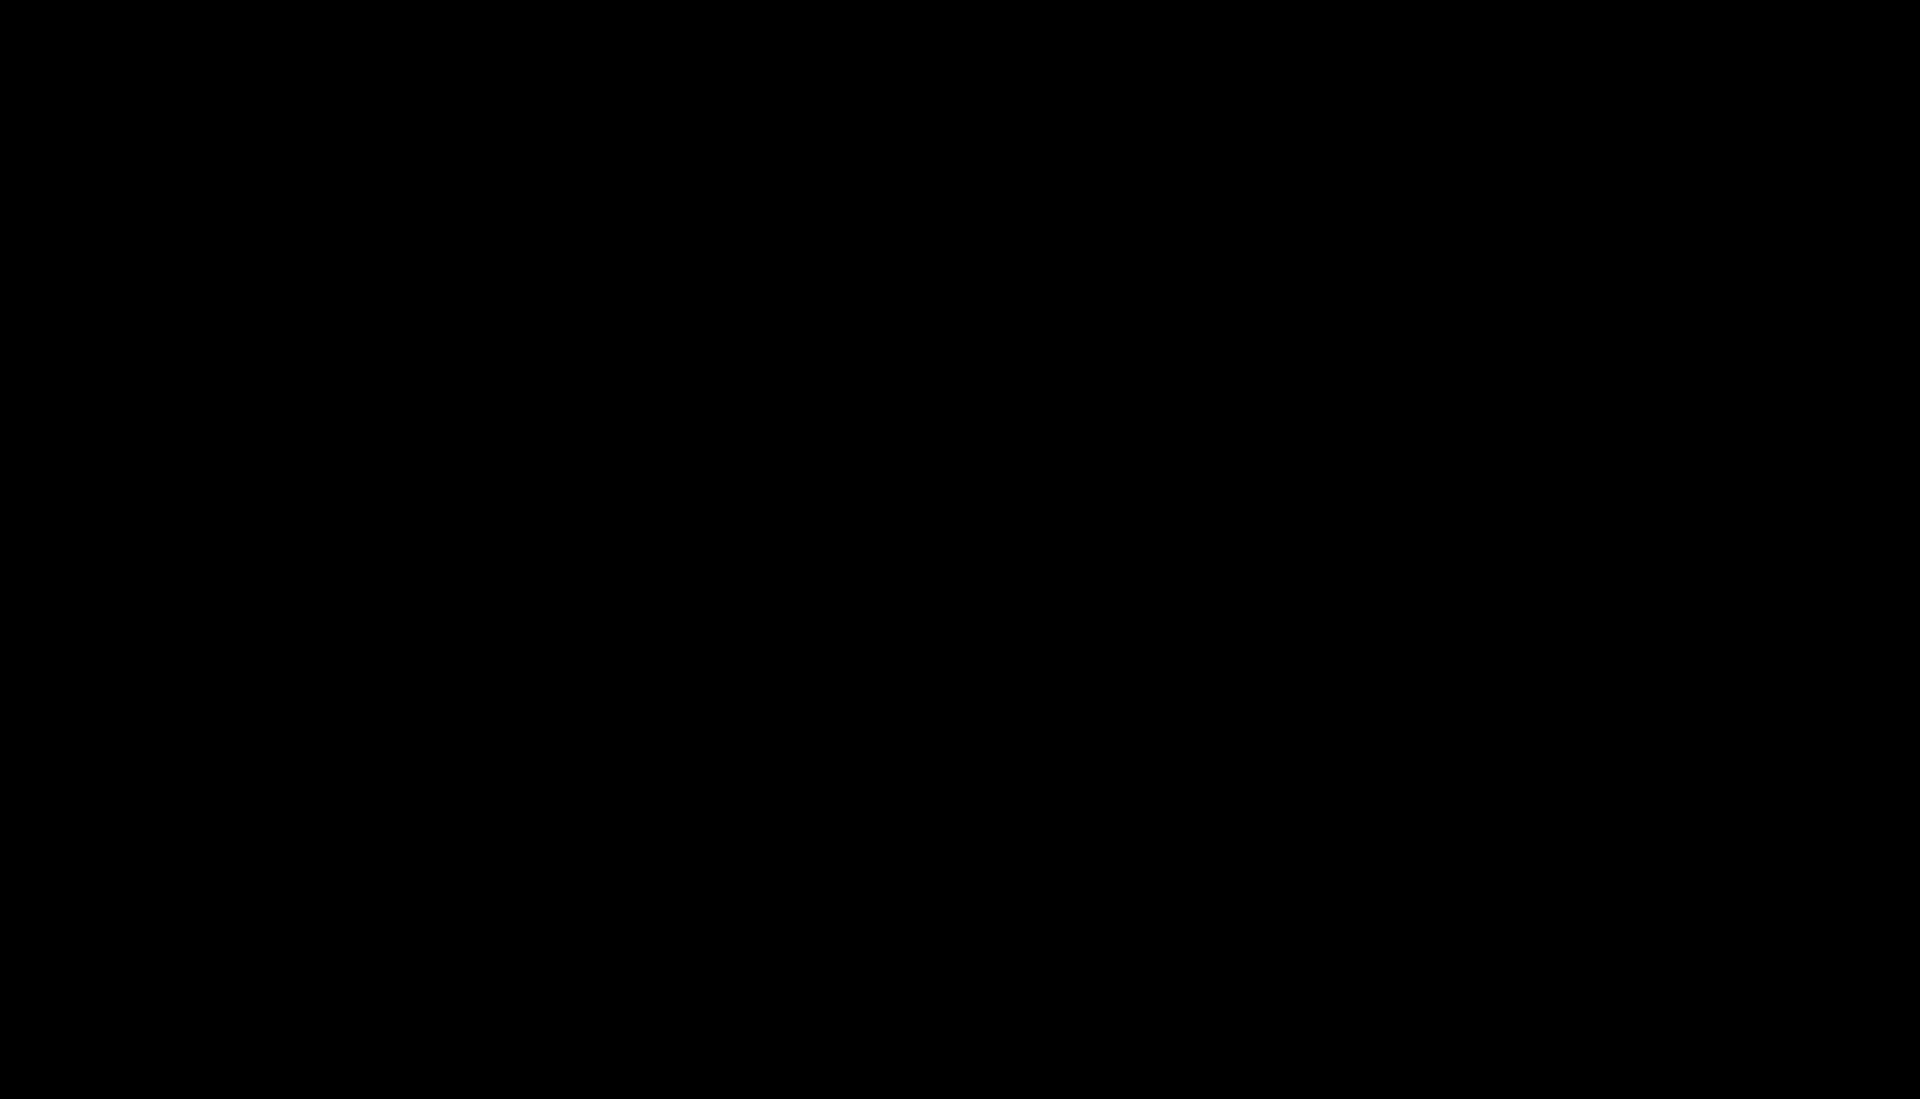 كوبالتي نيتريت الصوديوم Sodium Cobaltinitrite  Na3Co(NO2)6